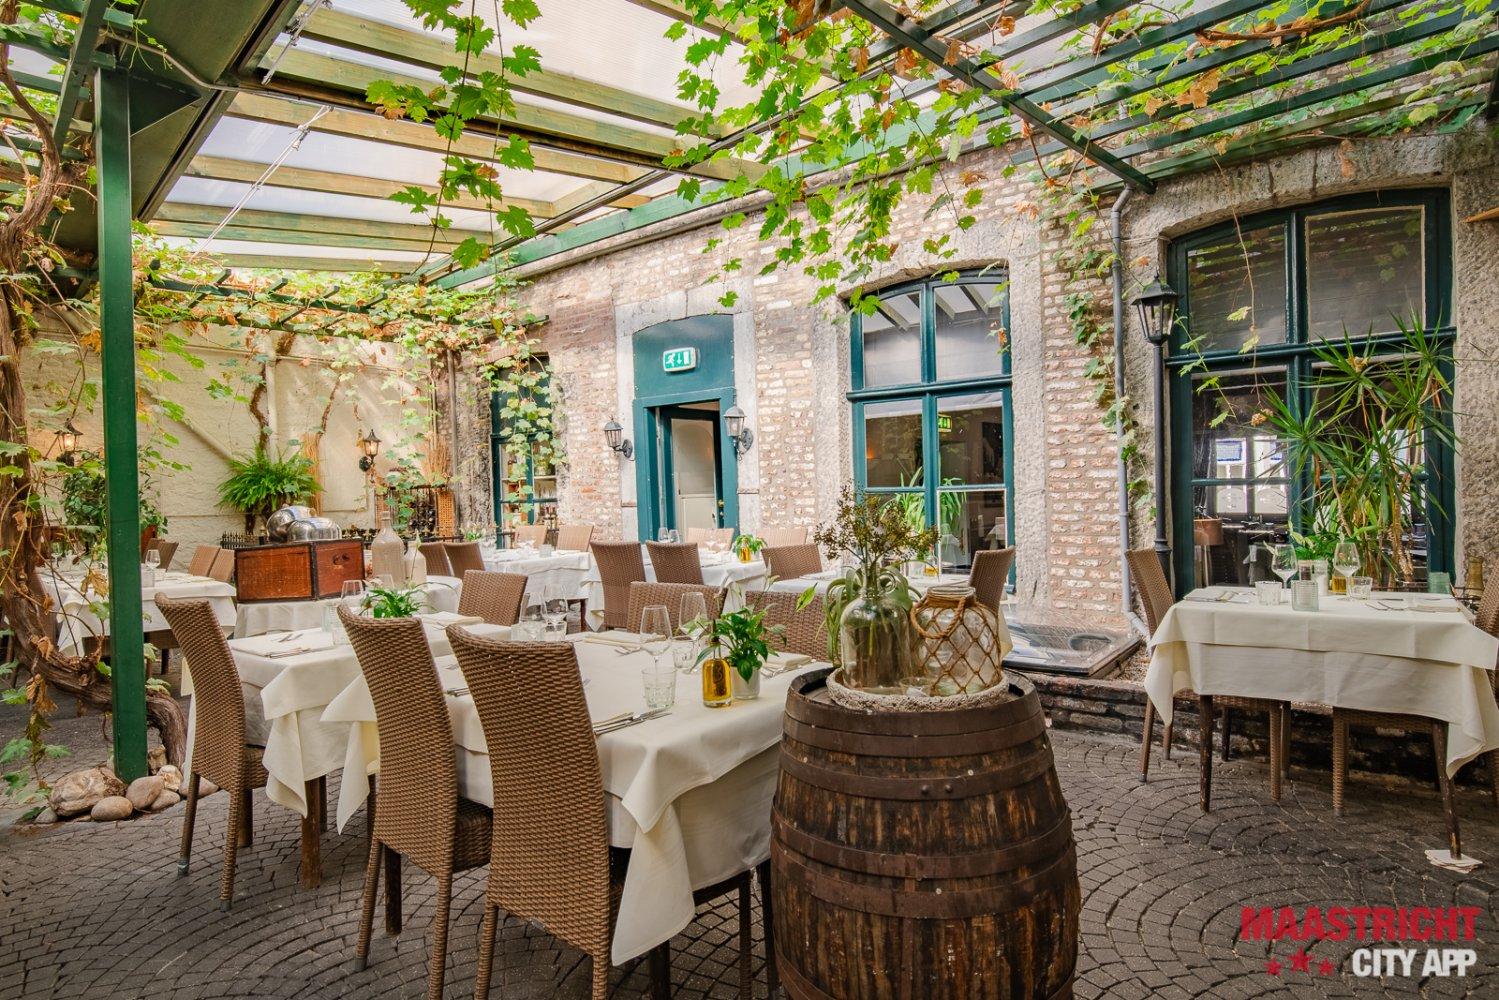 Restaurant Petit Bonheur - Maastricht City App